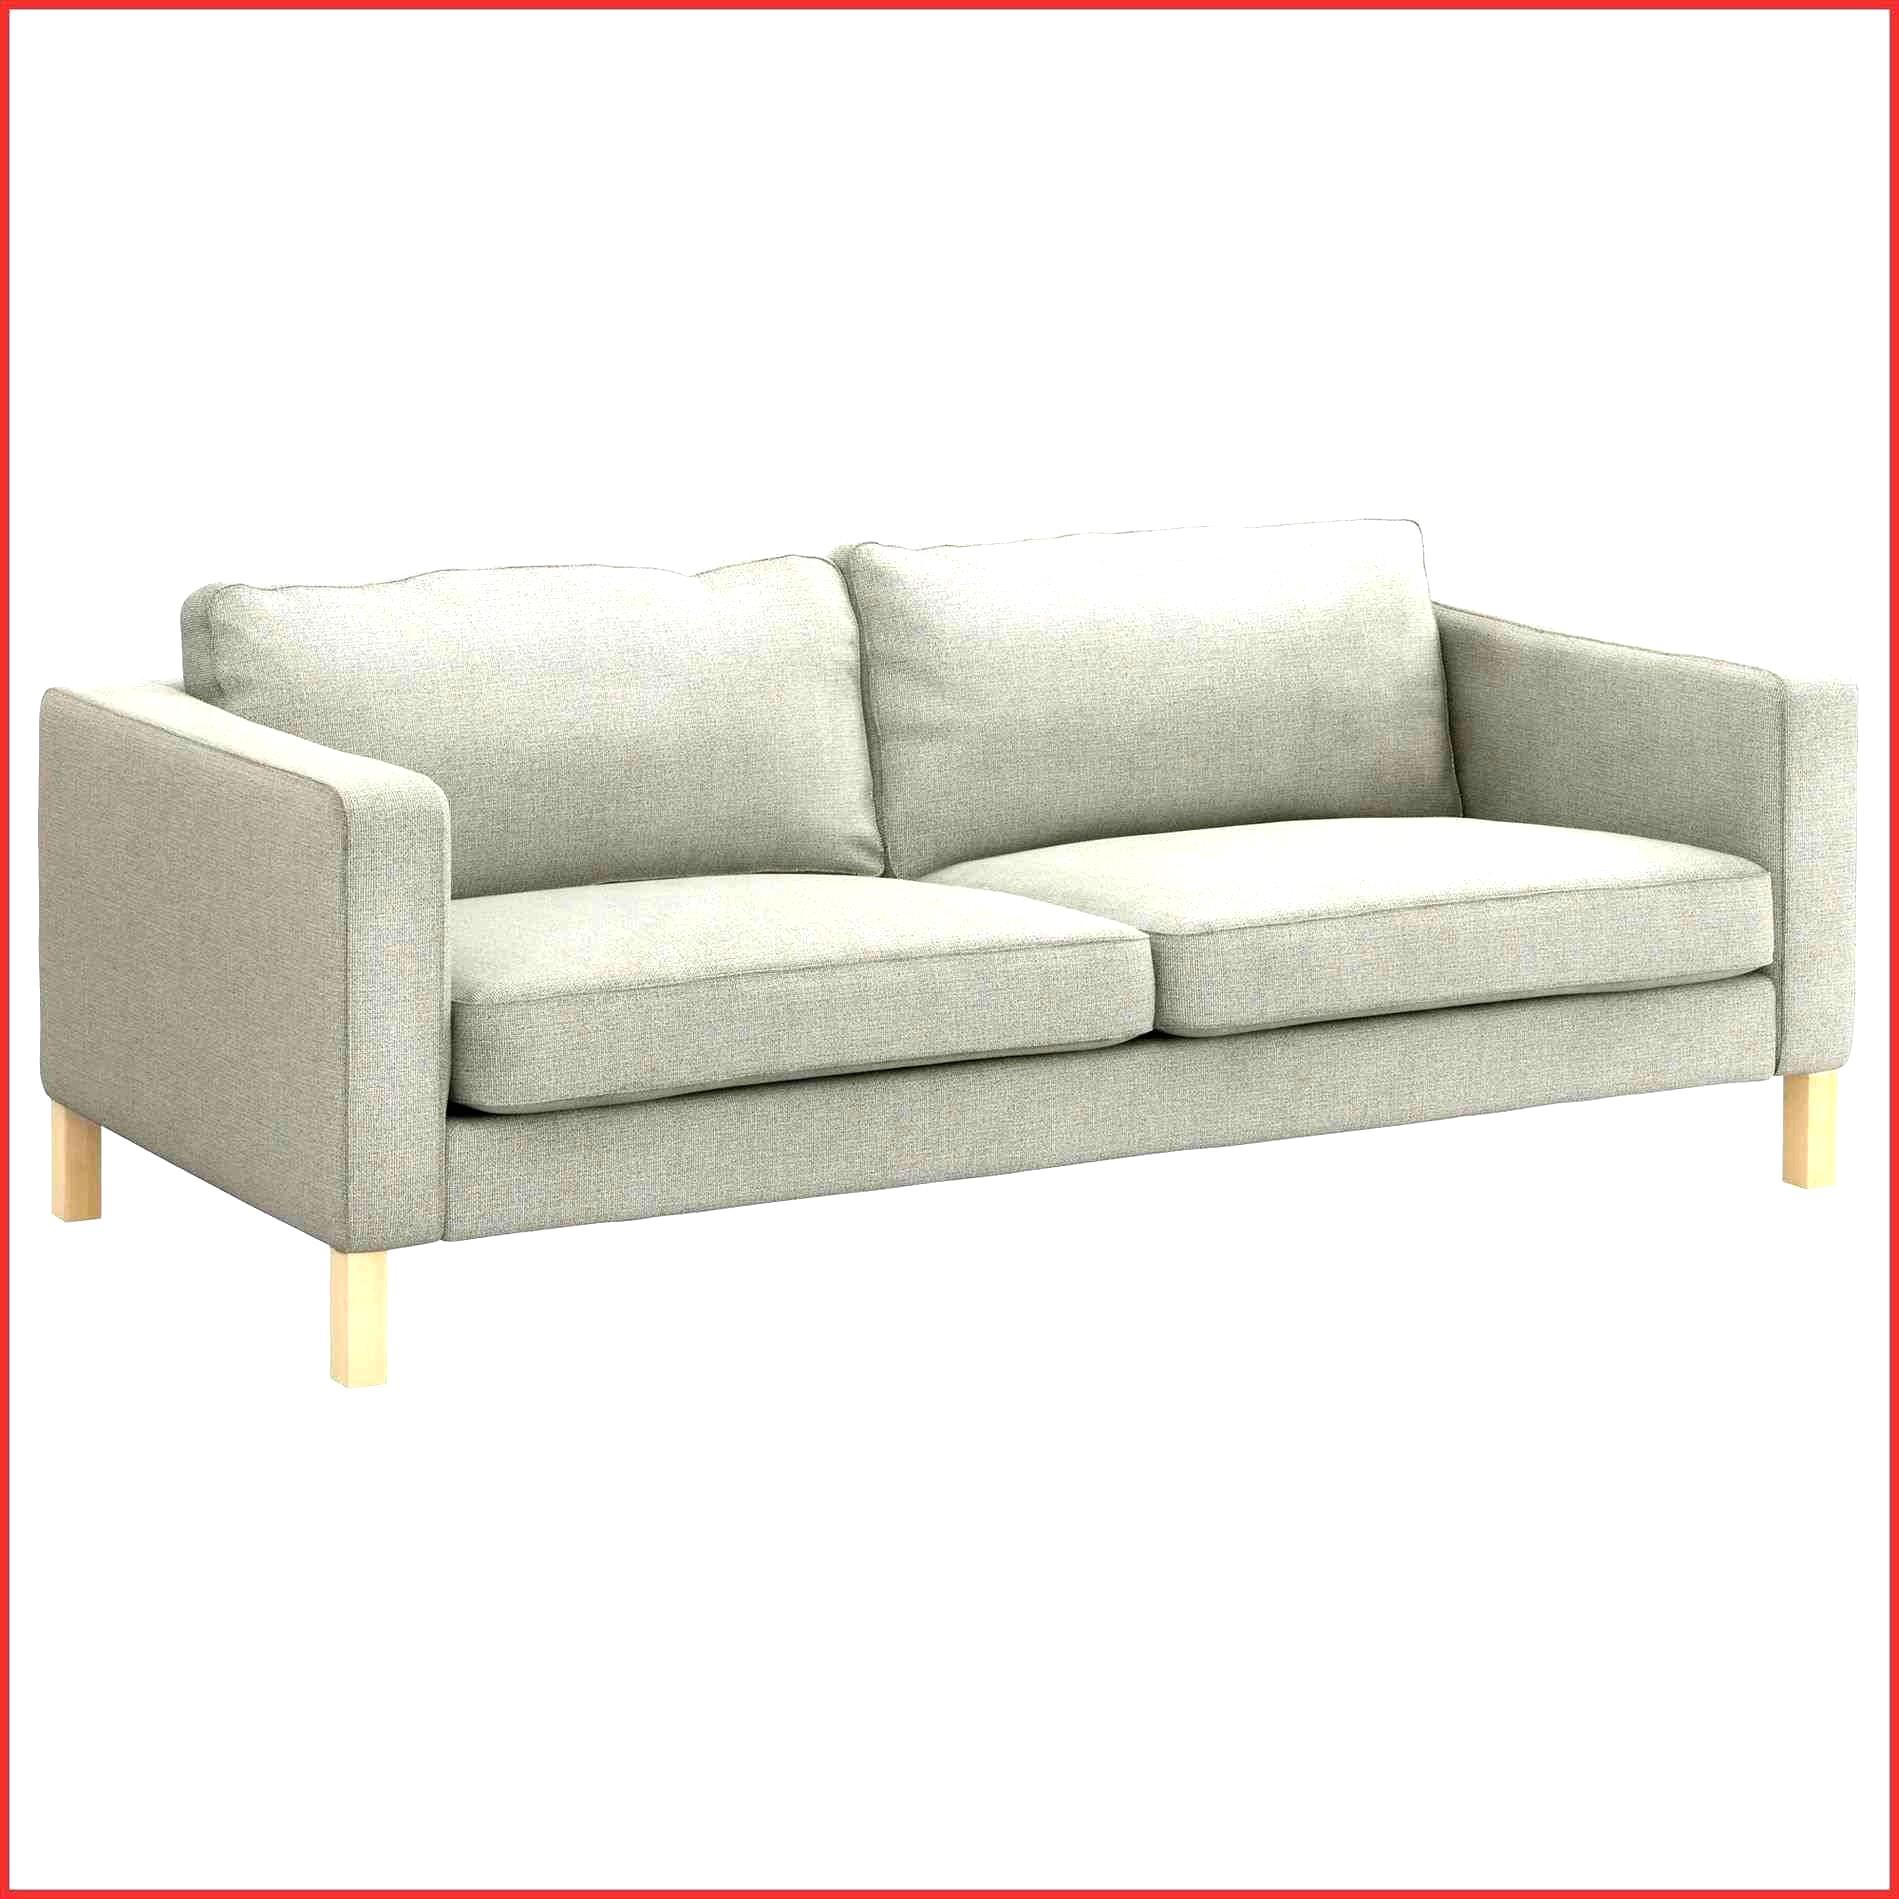 Bz Couchage Quotidien Ikea – Gamboahinestrosa encequiconcerne Gralviken Ikea